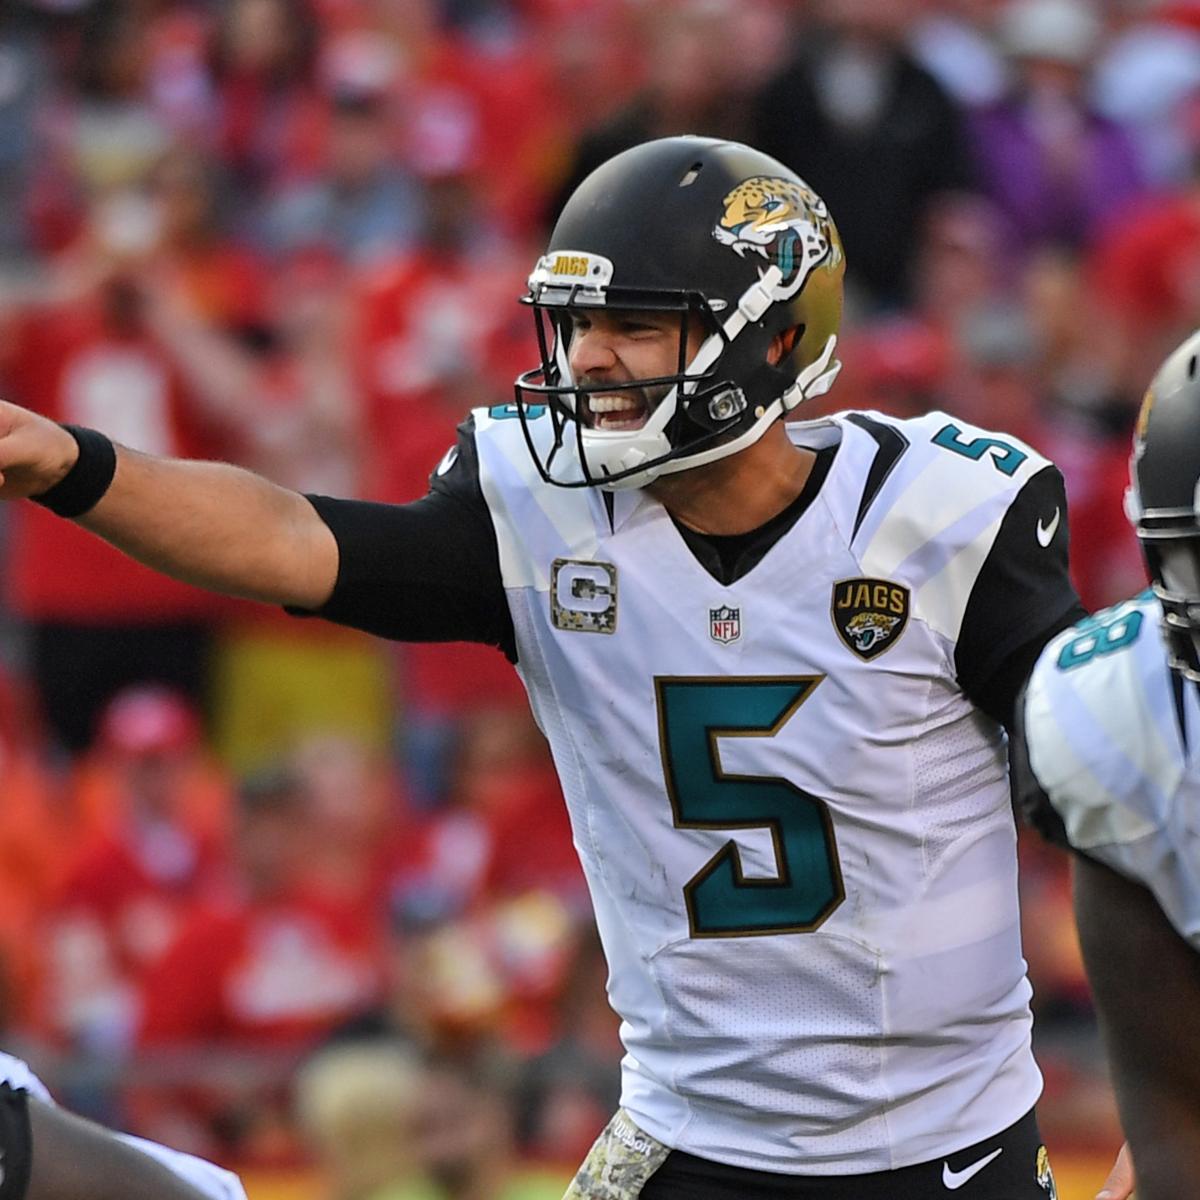 Denver Broncos Vs Detroit Lions Live Score Highlights And: Houston Texans Vs. Jacksonville Jaguars Betting Odds